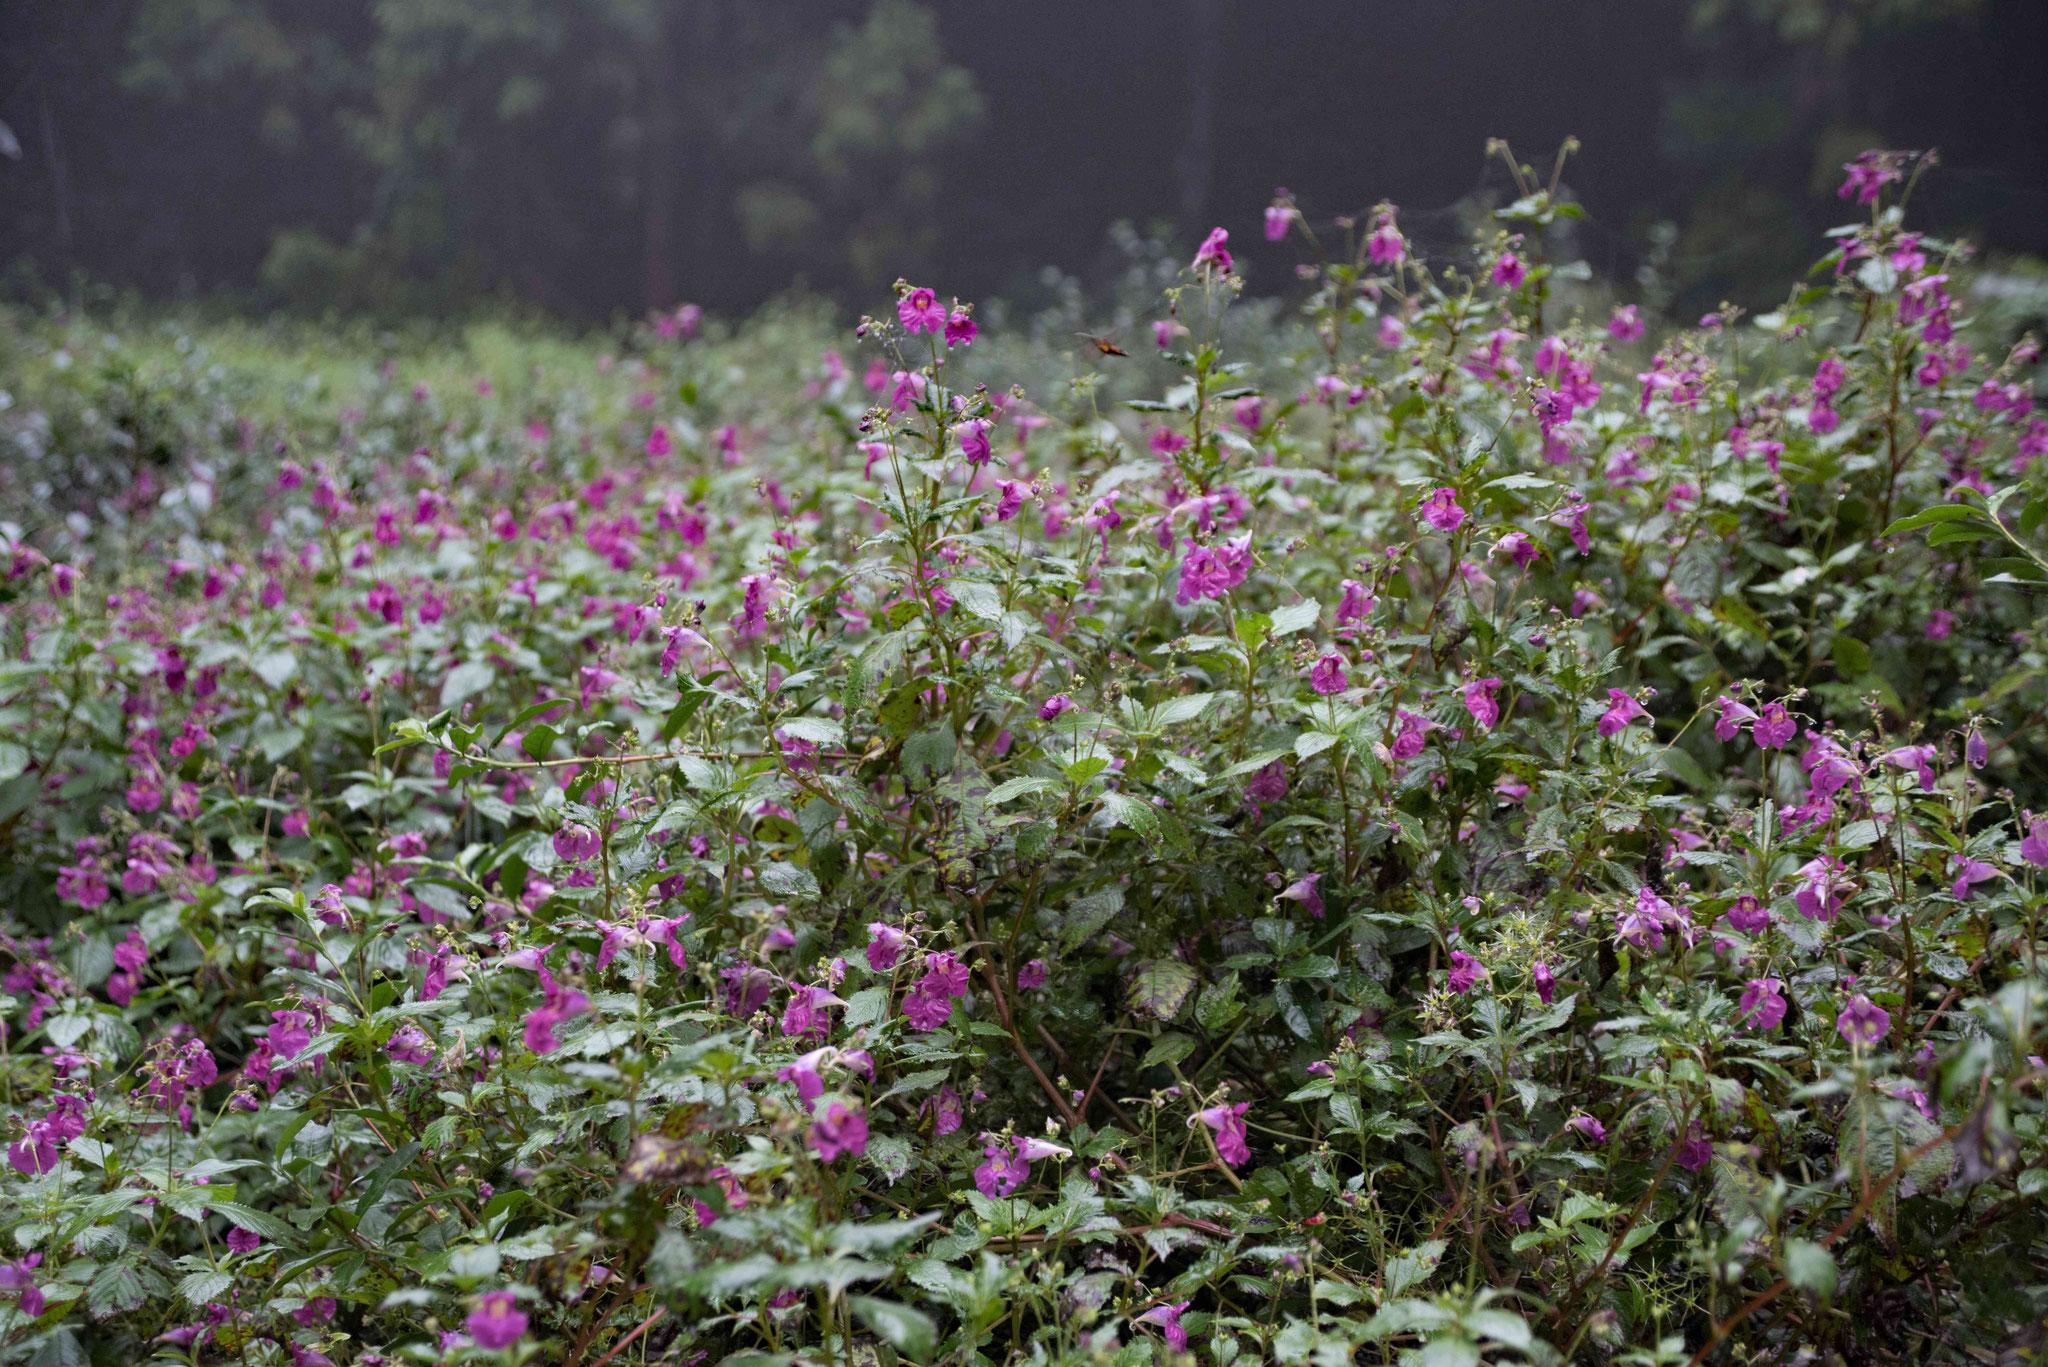 Bunte Blumen am Rande der Plantage